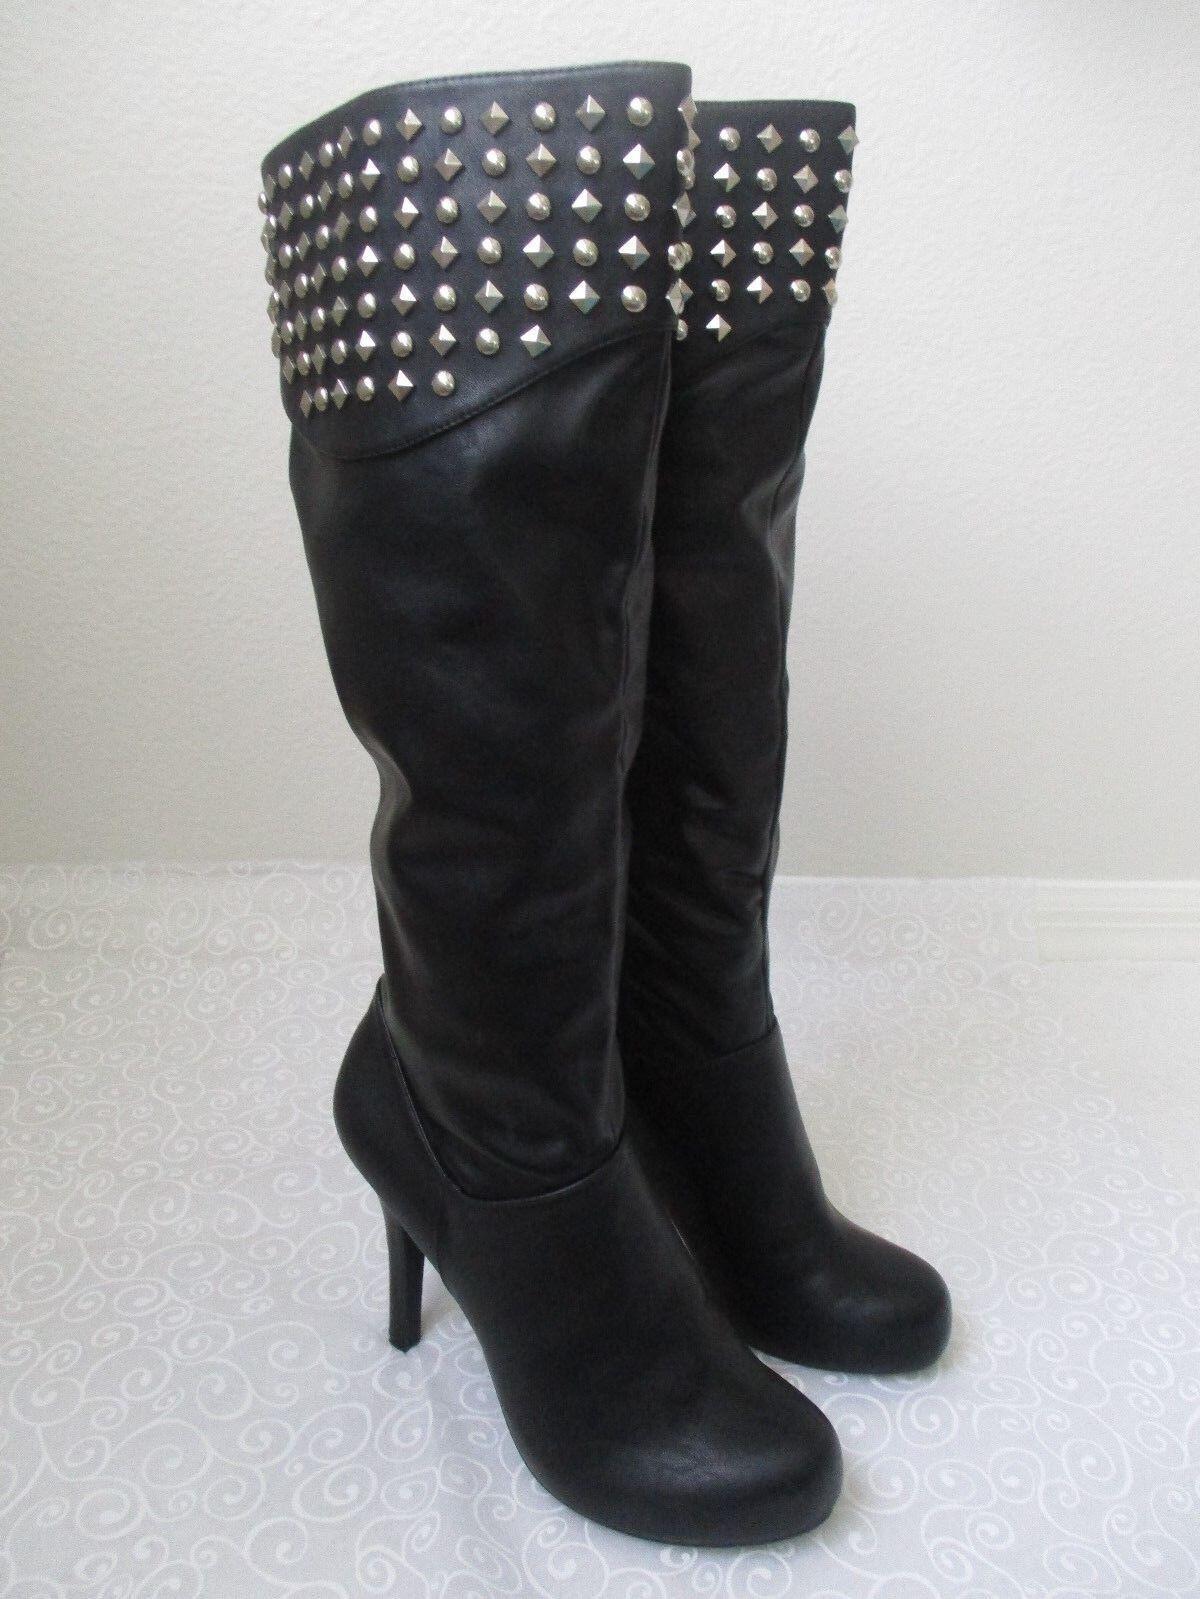 179 botas de alto BCBGENERATION Negro Studd Kee tamaño tamaño tamaño 10 M-Nuevo  solo para ti